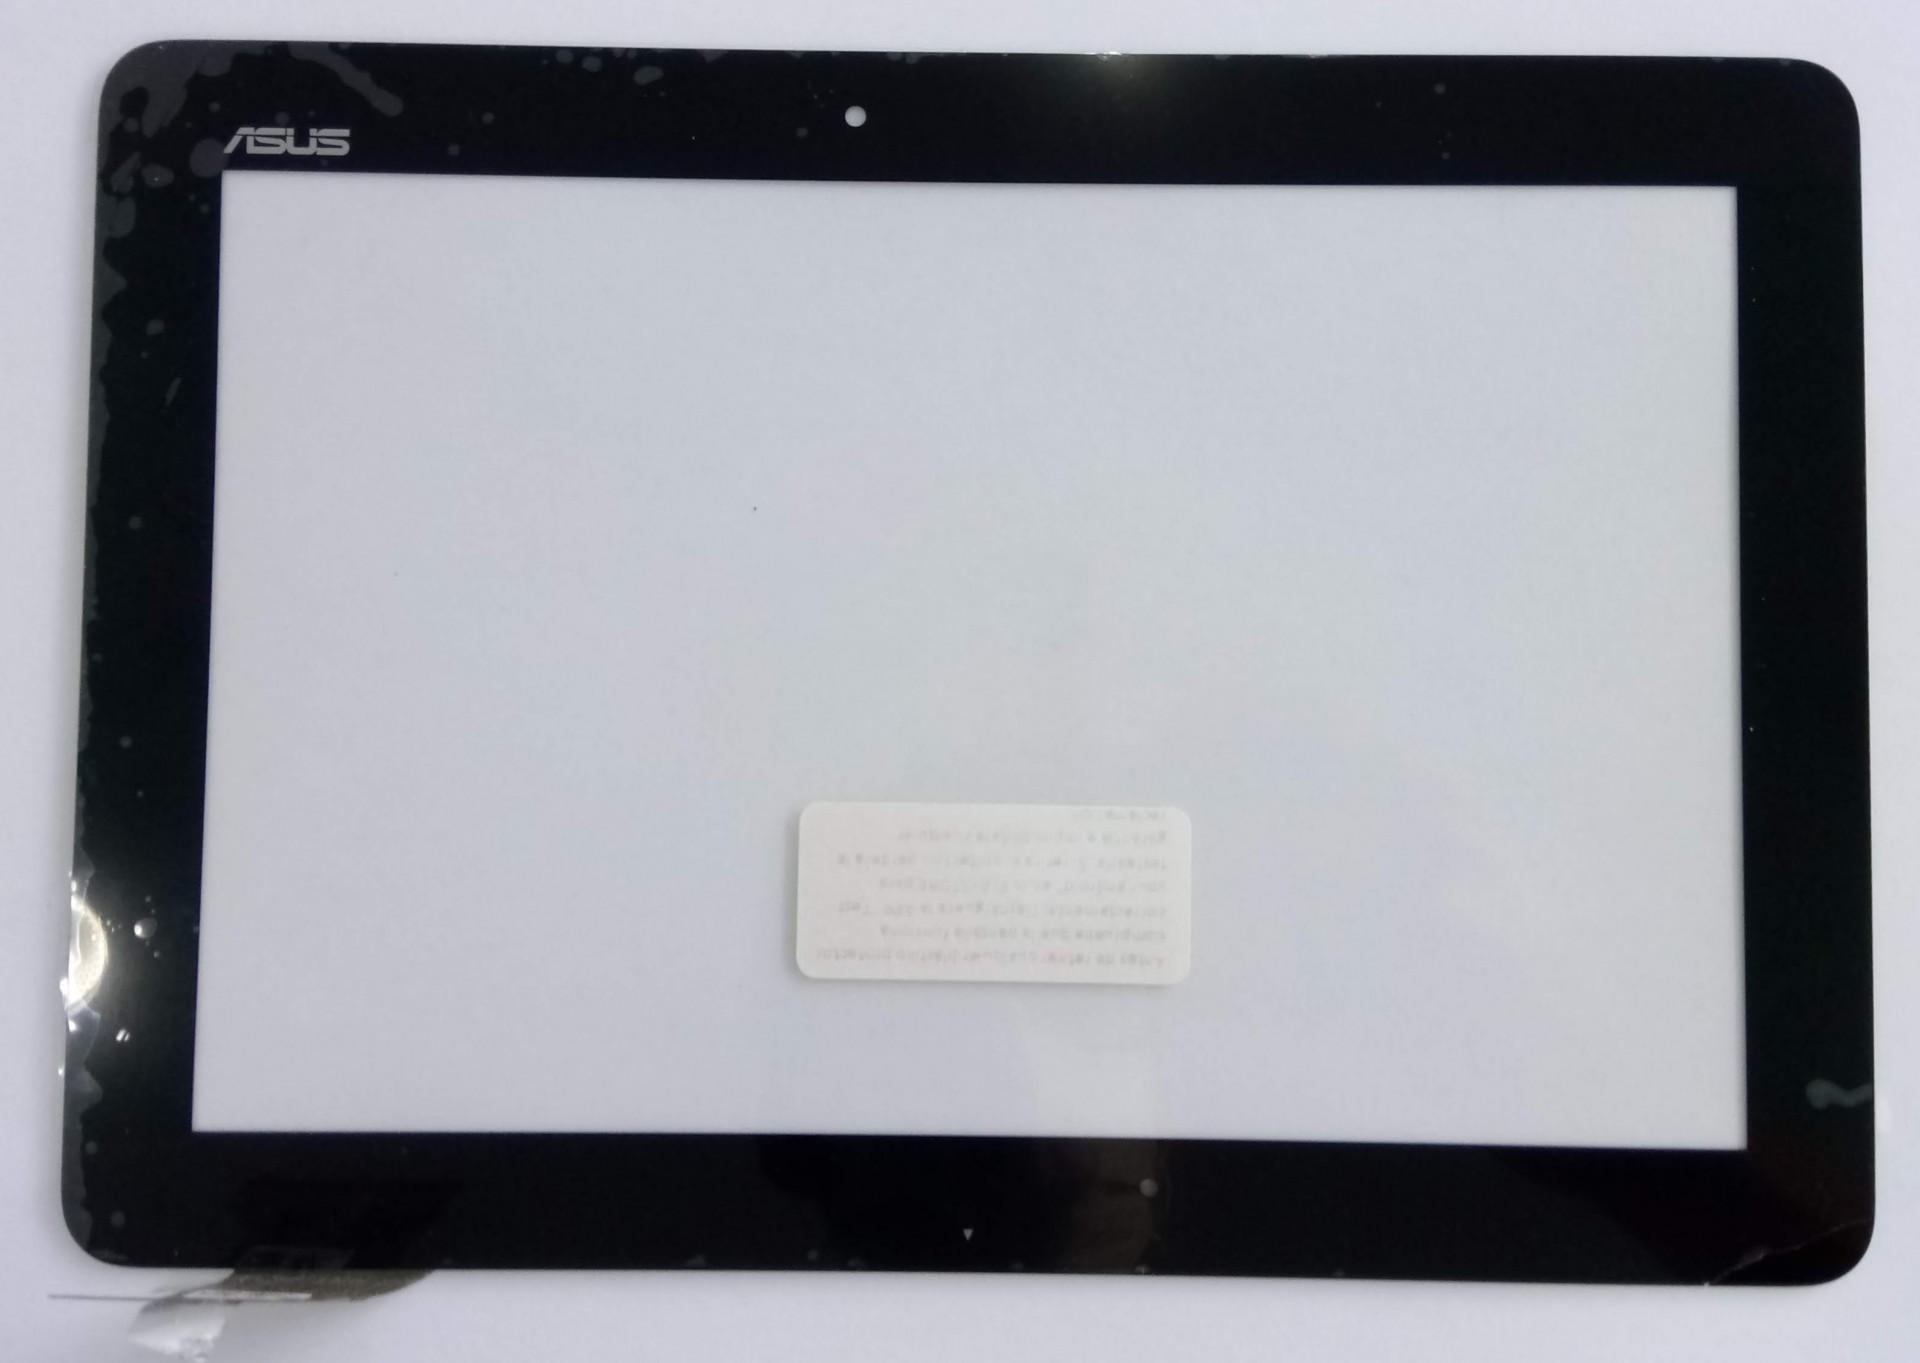 Tátil tablet Asus TF103C, K010 negra